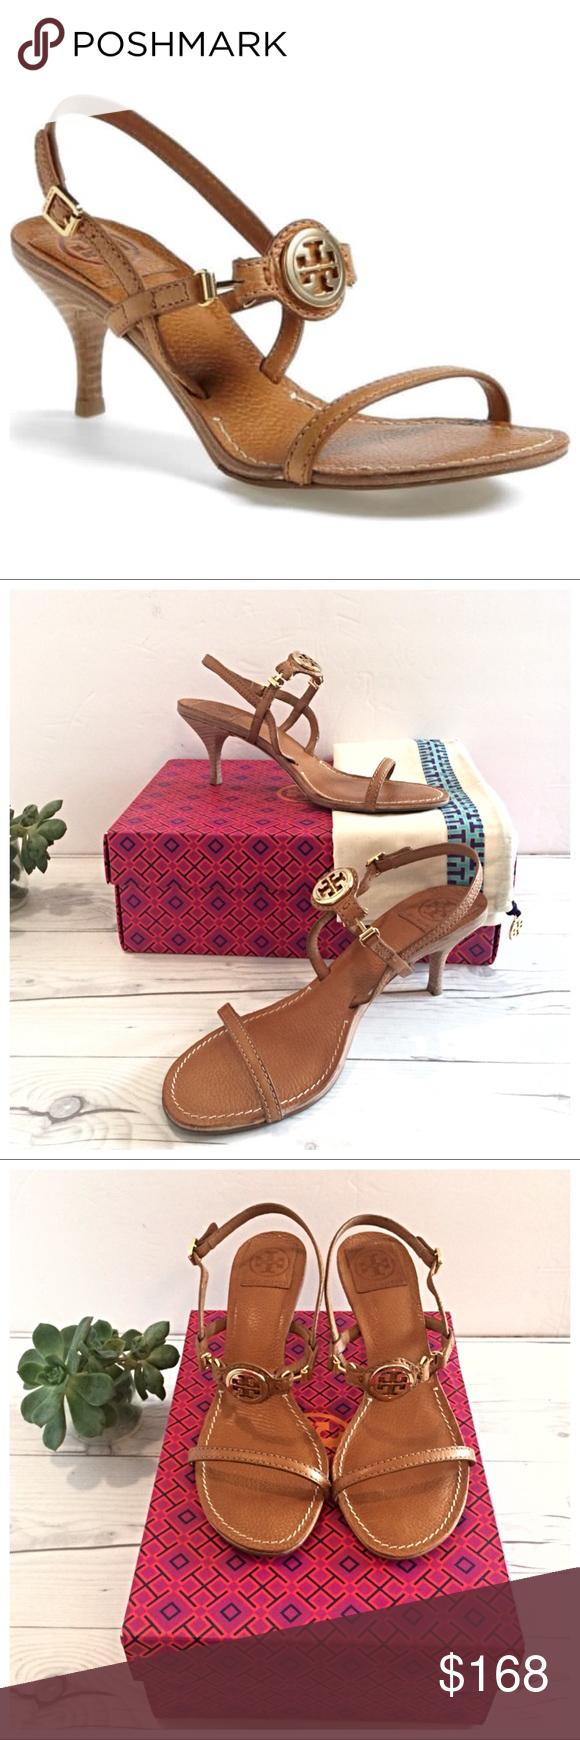 ce473dc506fd Tory Burch Mira Tan Leather Gold Logo Sandals Gorgeous